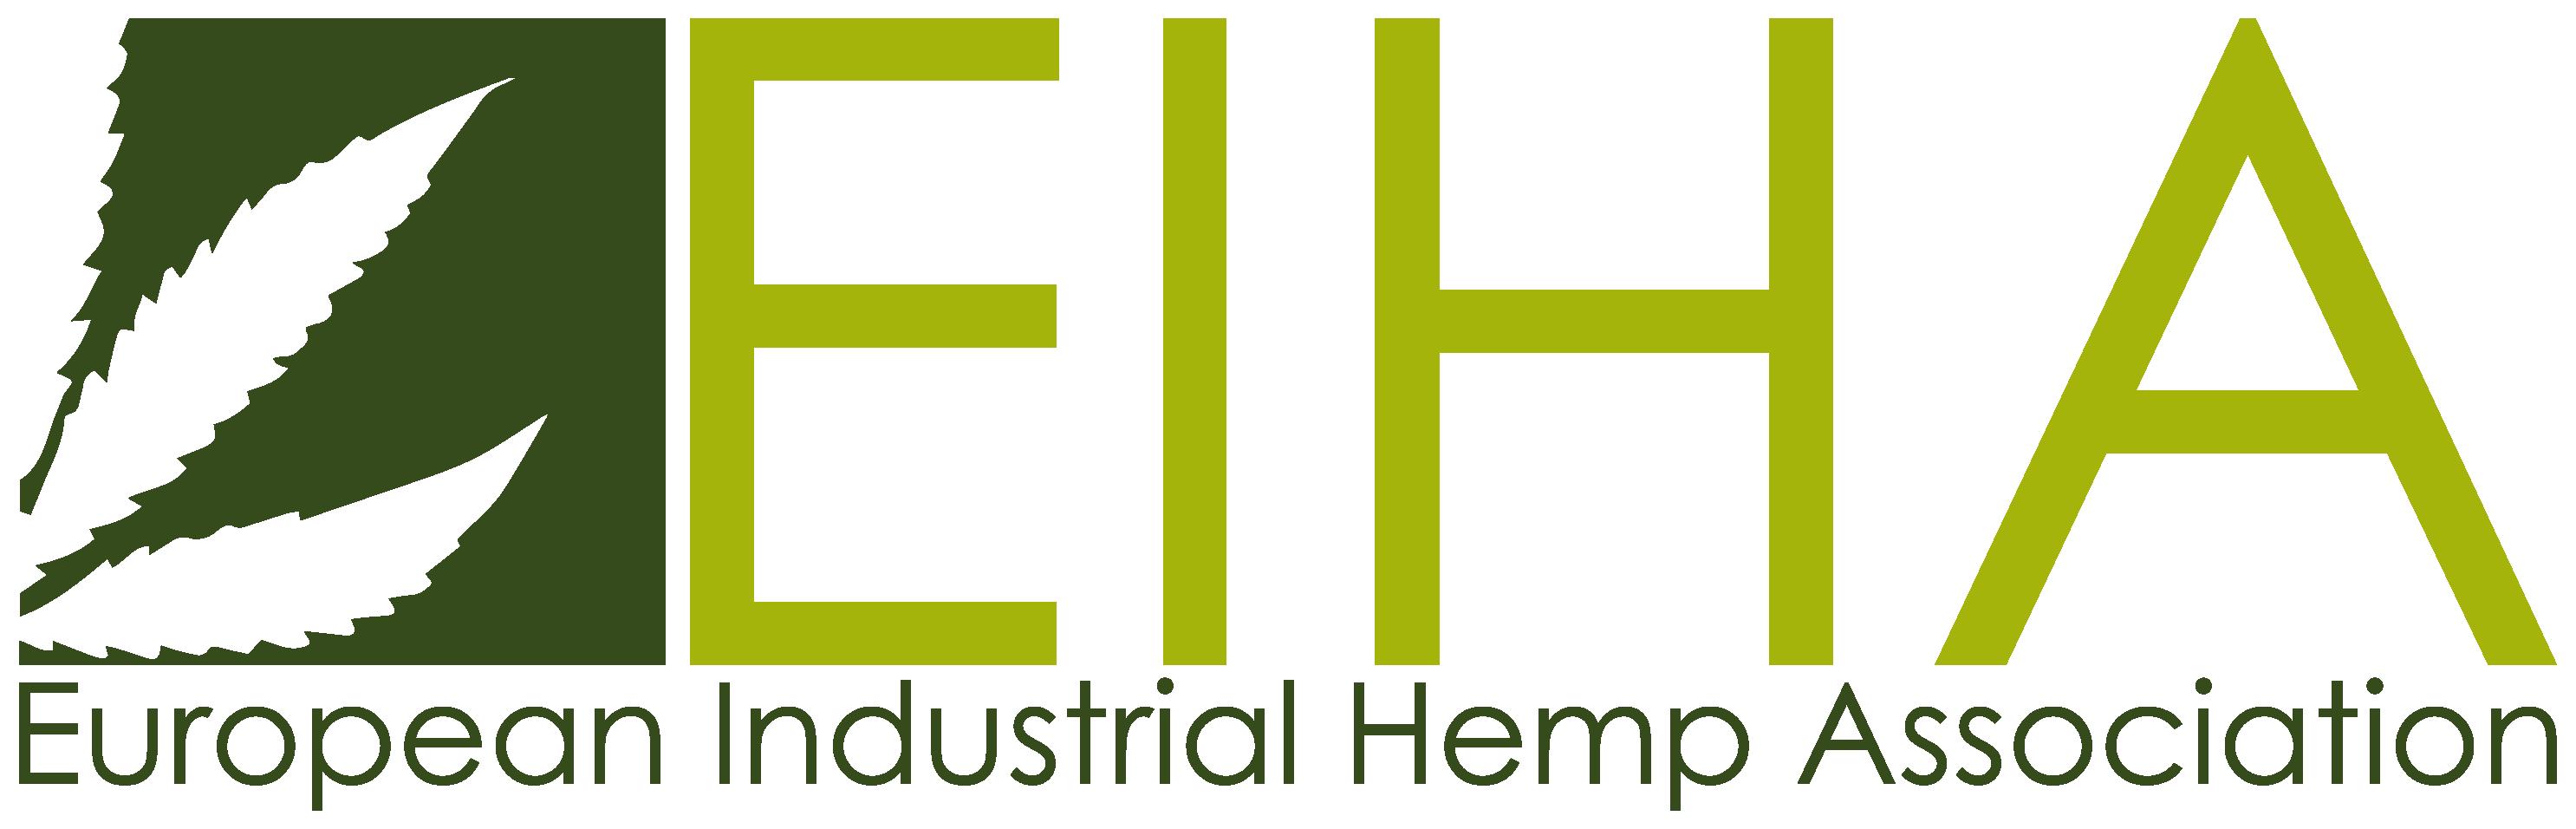 Eiha – European Industrial Hemp Association